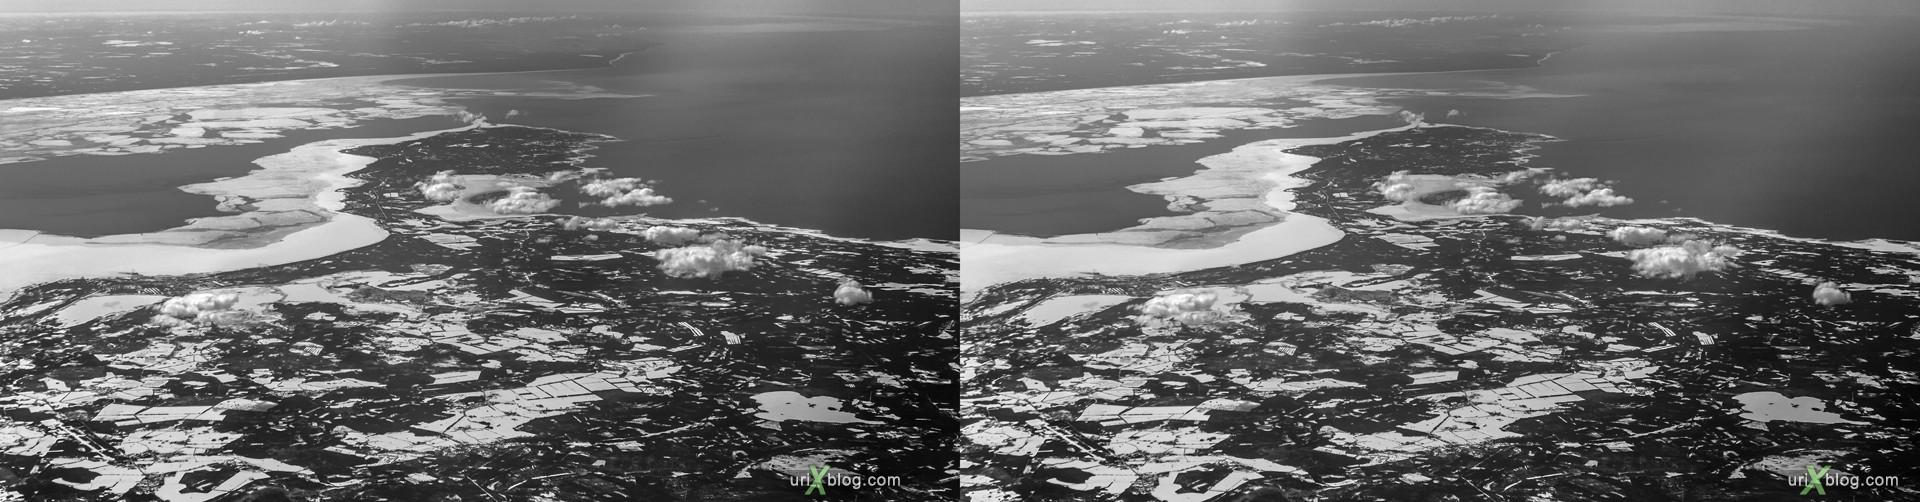 2013, Baltic sea, Gulf of Riga, Saaremaa island, Estonia, panorama, airplane, black and white, bw, snow, ice, clouds, horizon, 3D, stereo pair, cross-eyed, crossview, cross view stereo pair, stereoscopic